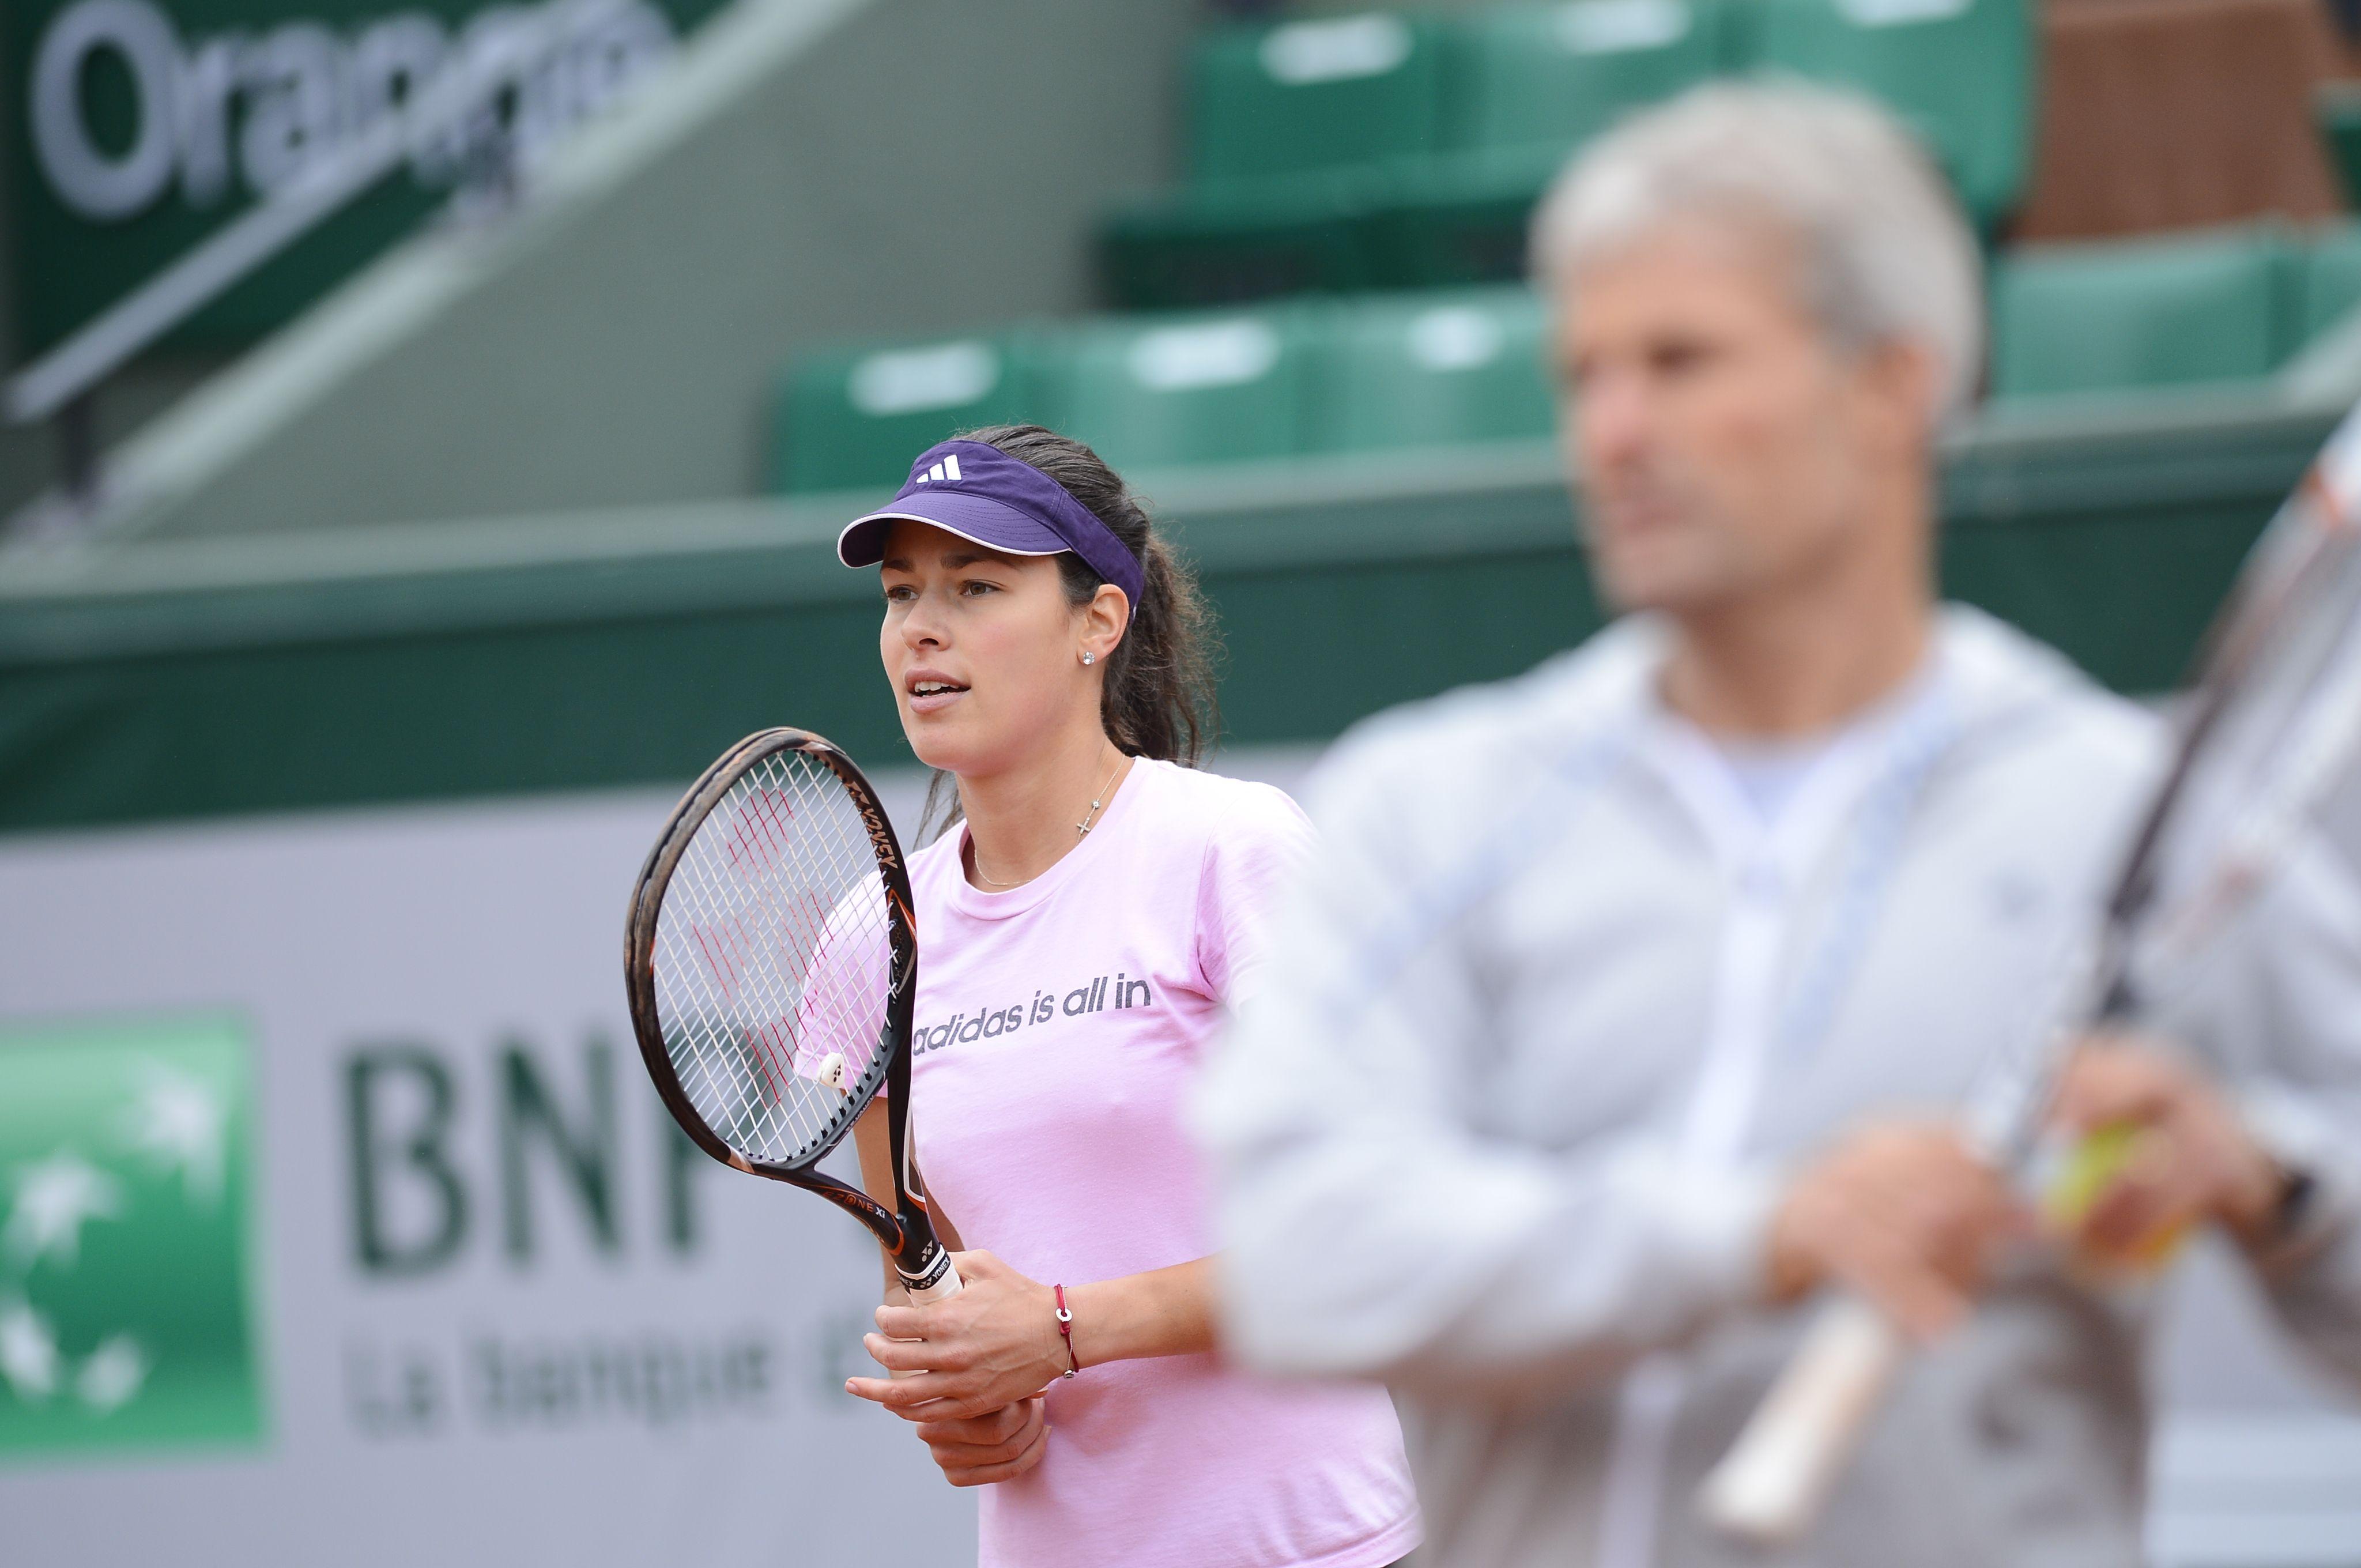 omens tennis news archive - HD4096×2720